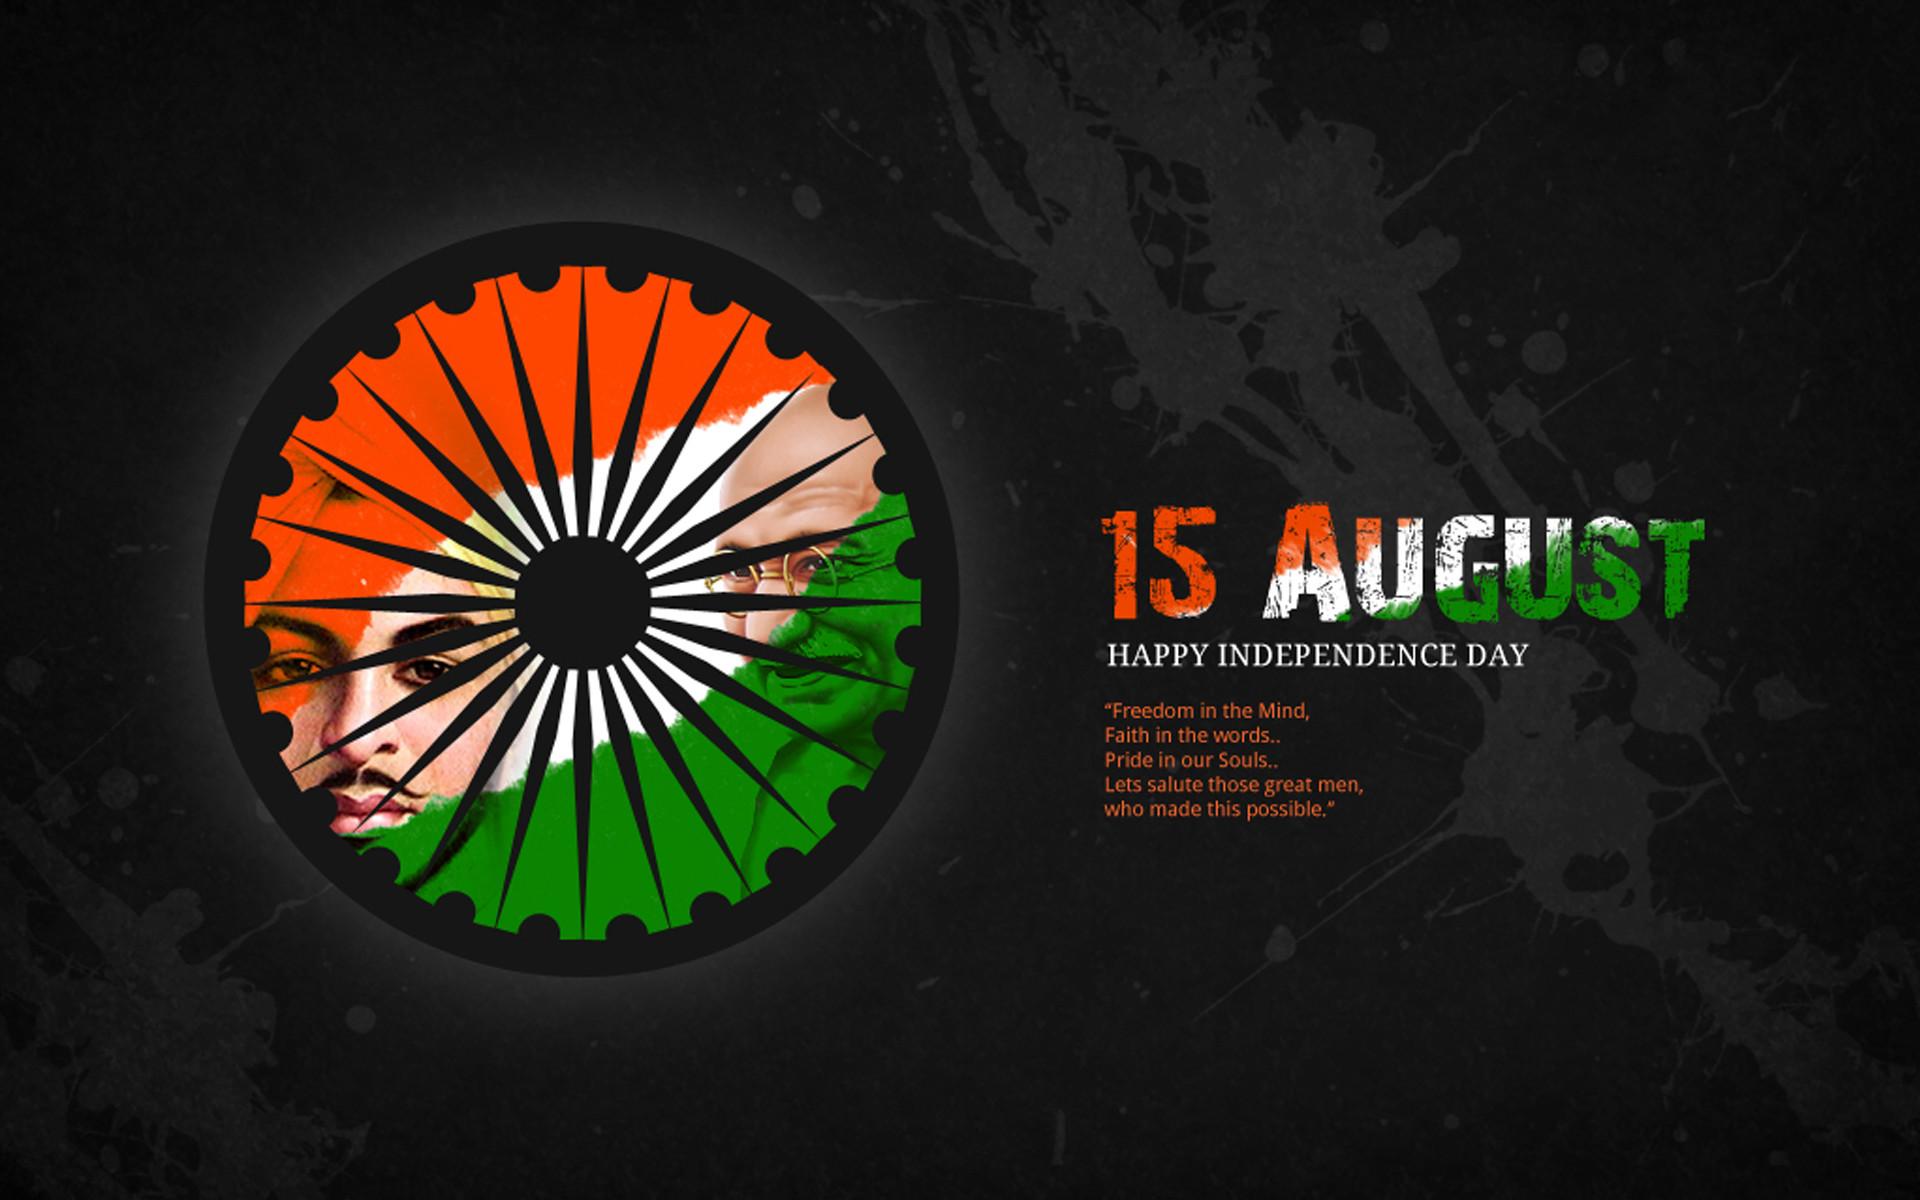 Wallpaper Hd India 71 Images